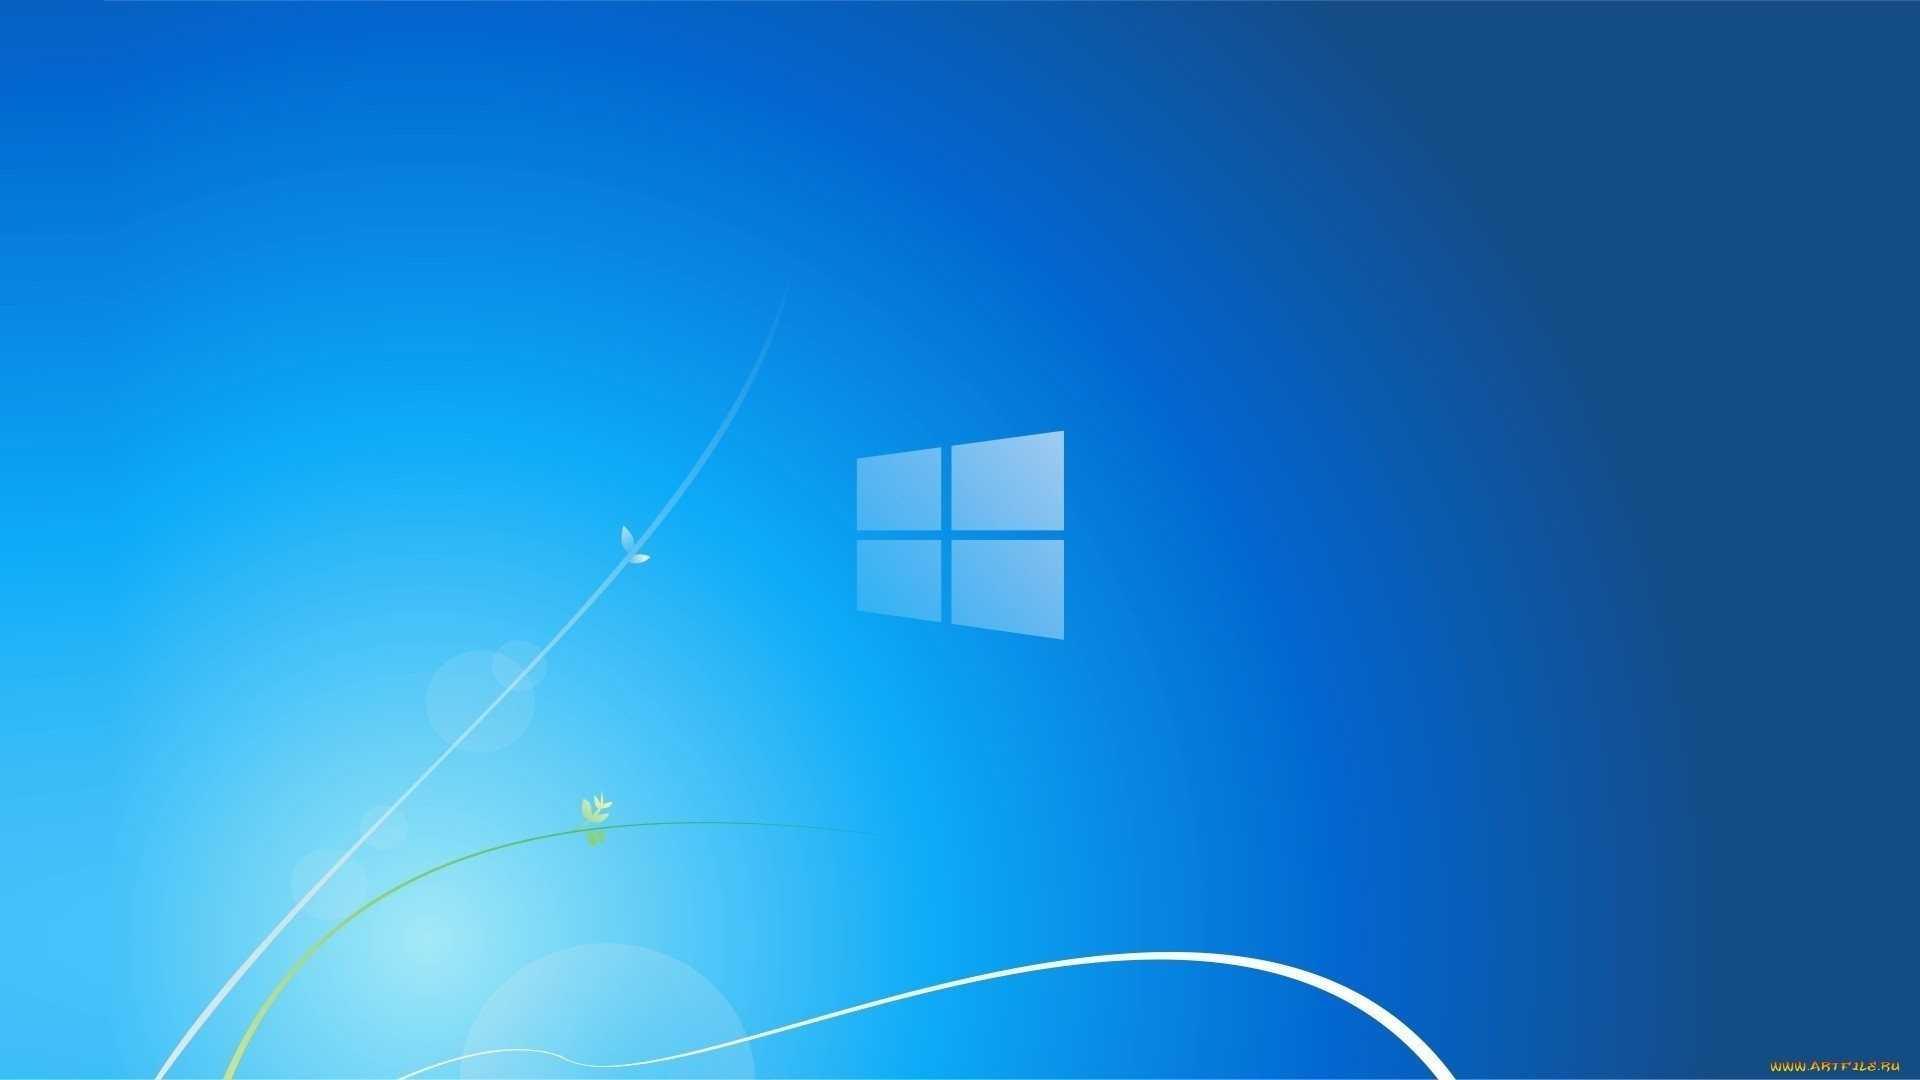 Windows 7 live wallpaper - SF Wallpaper